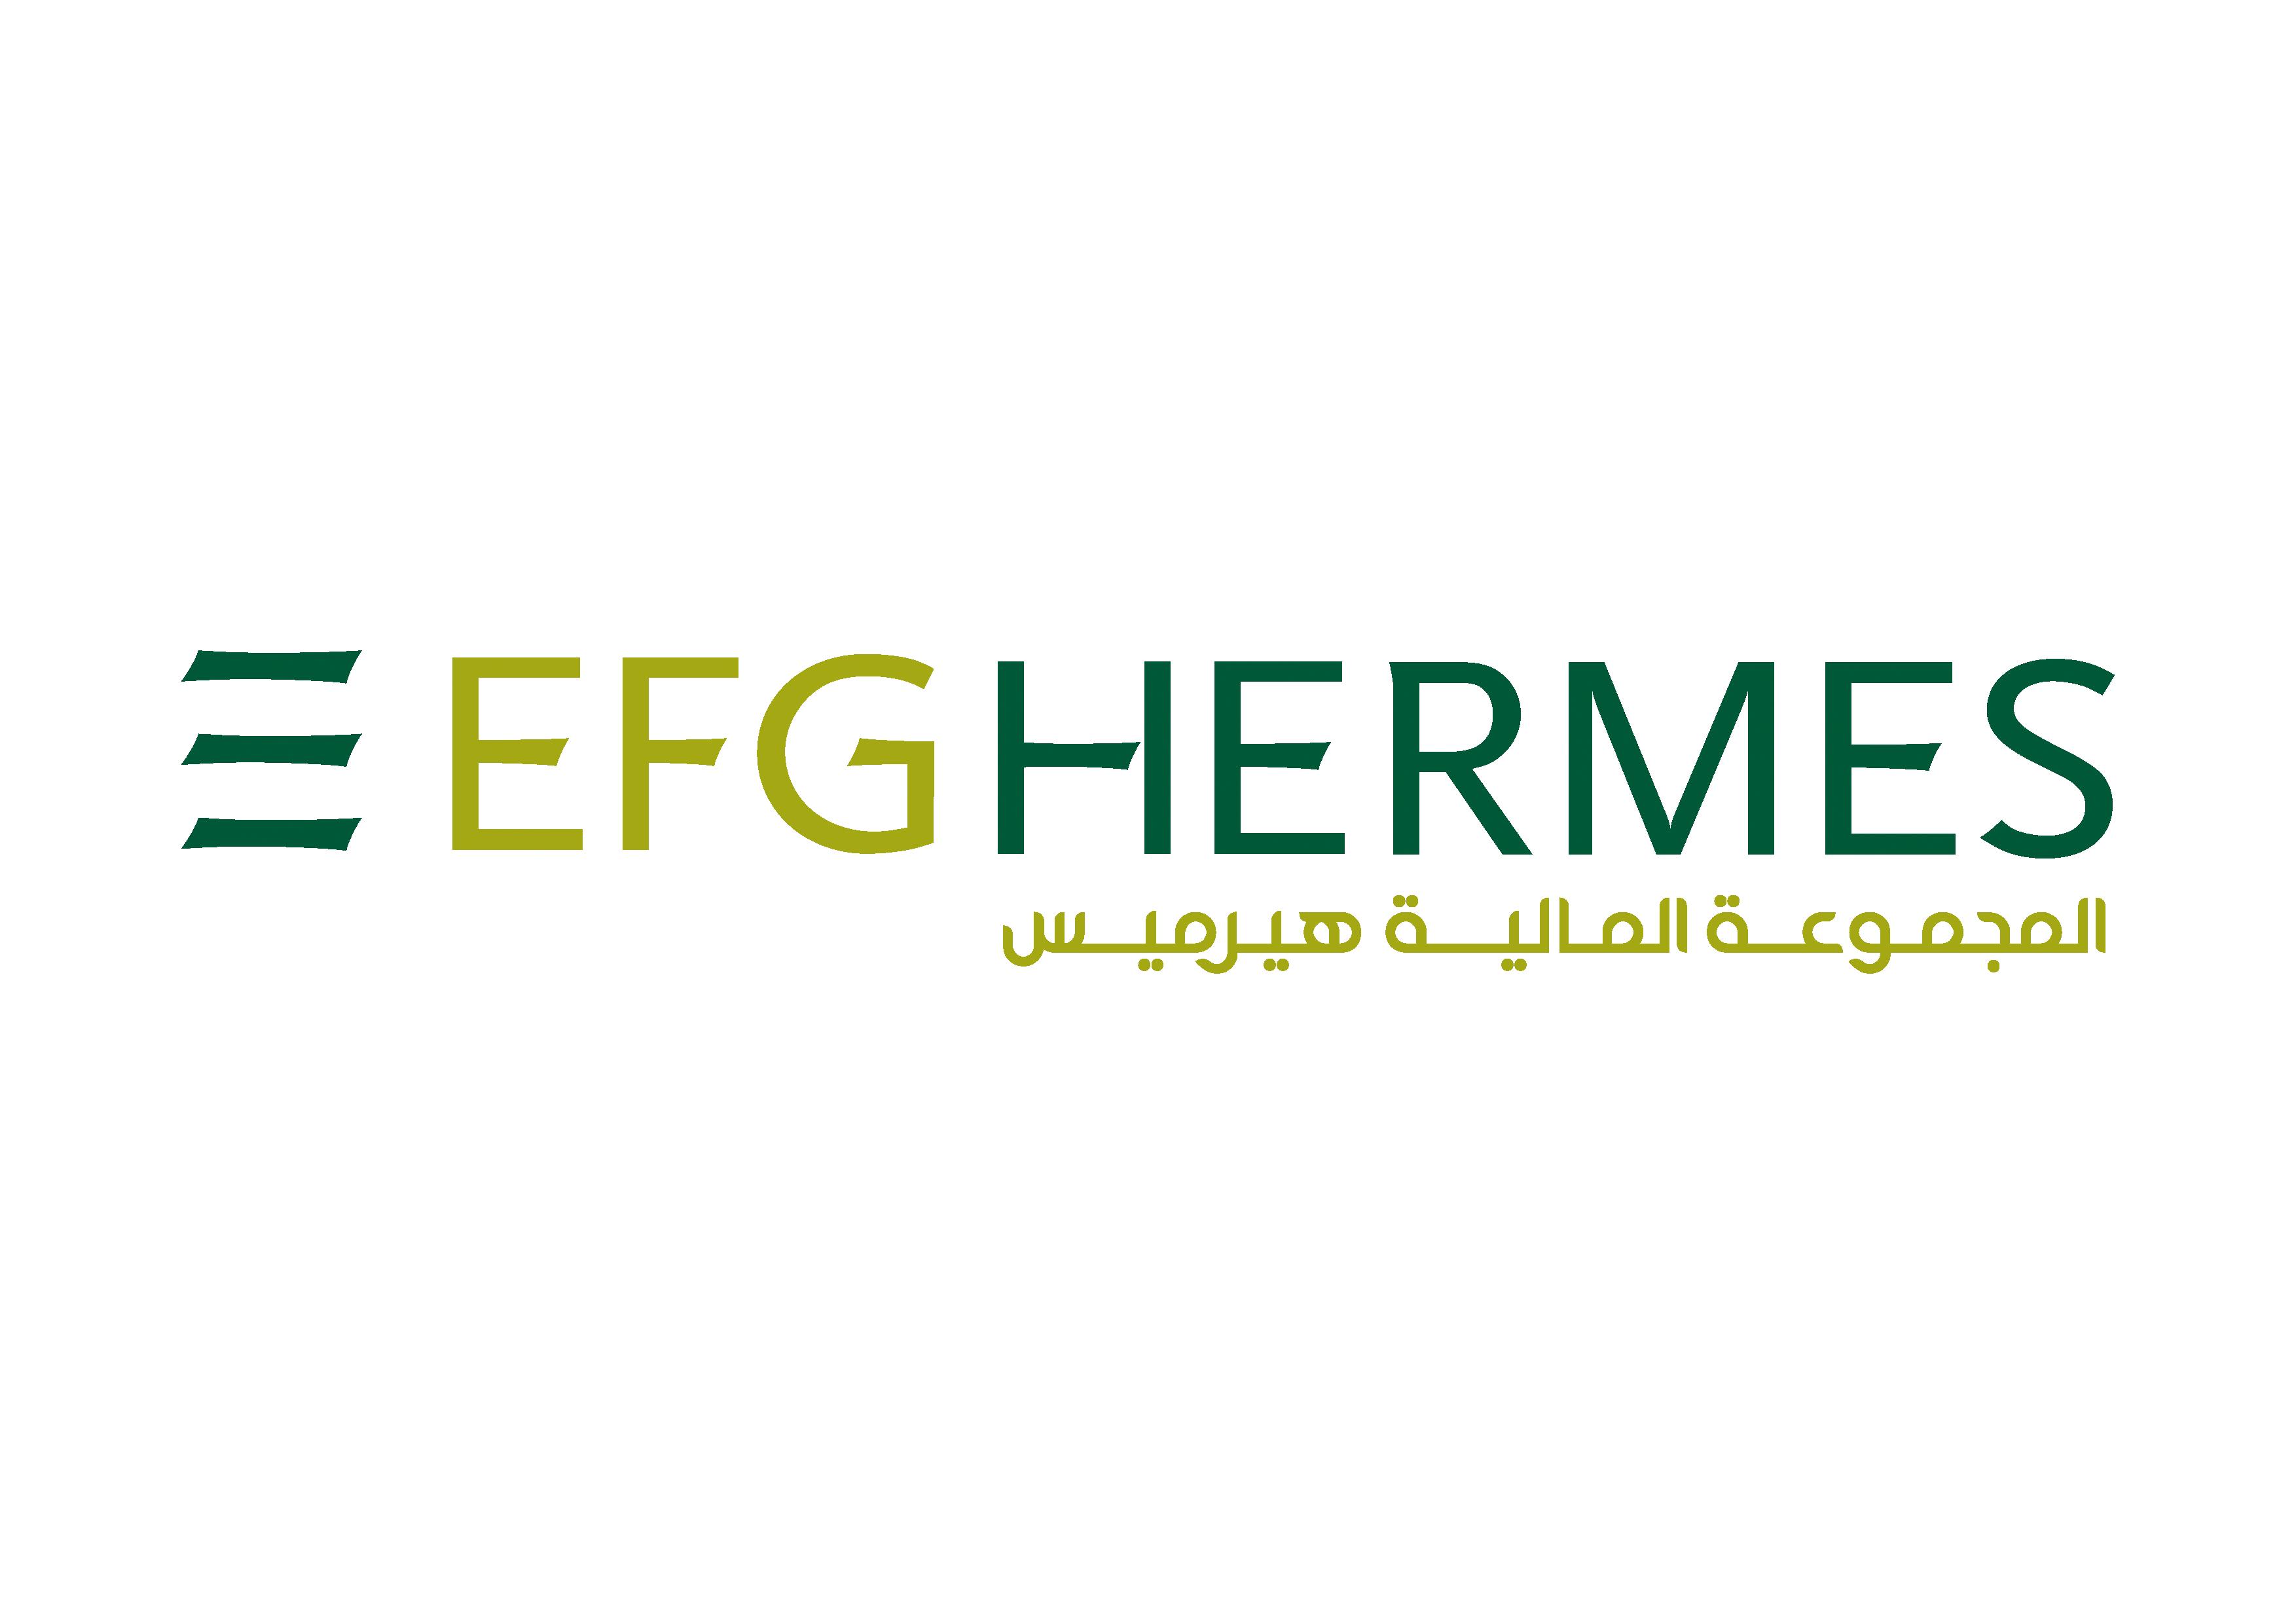 EFG-Hermes-logo-large-qatarisbooming.com_